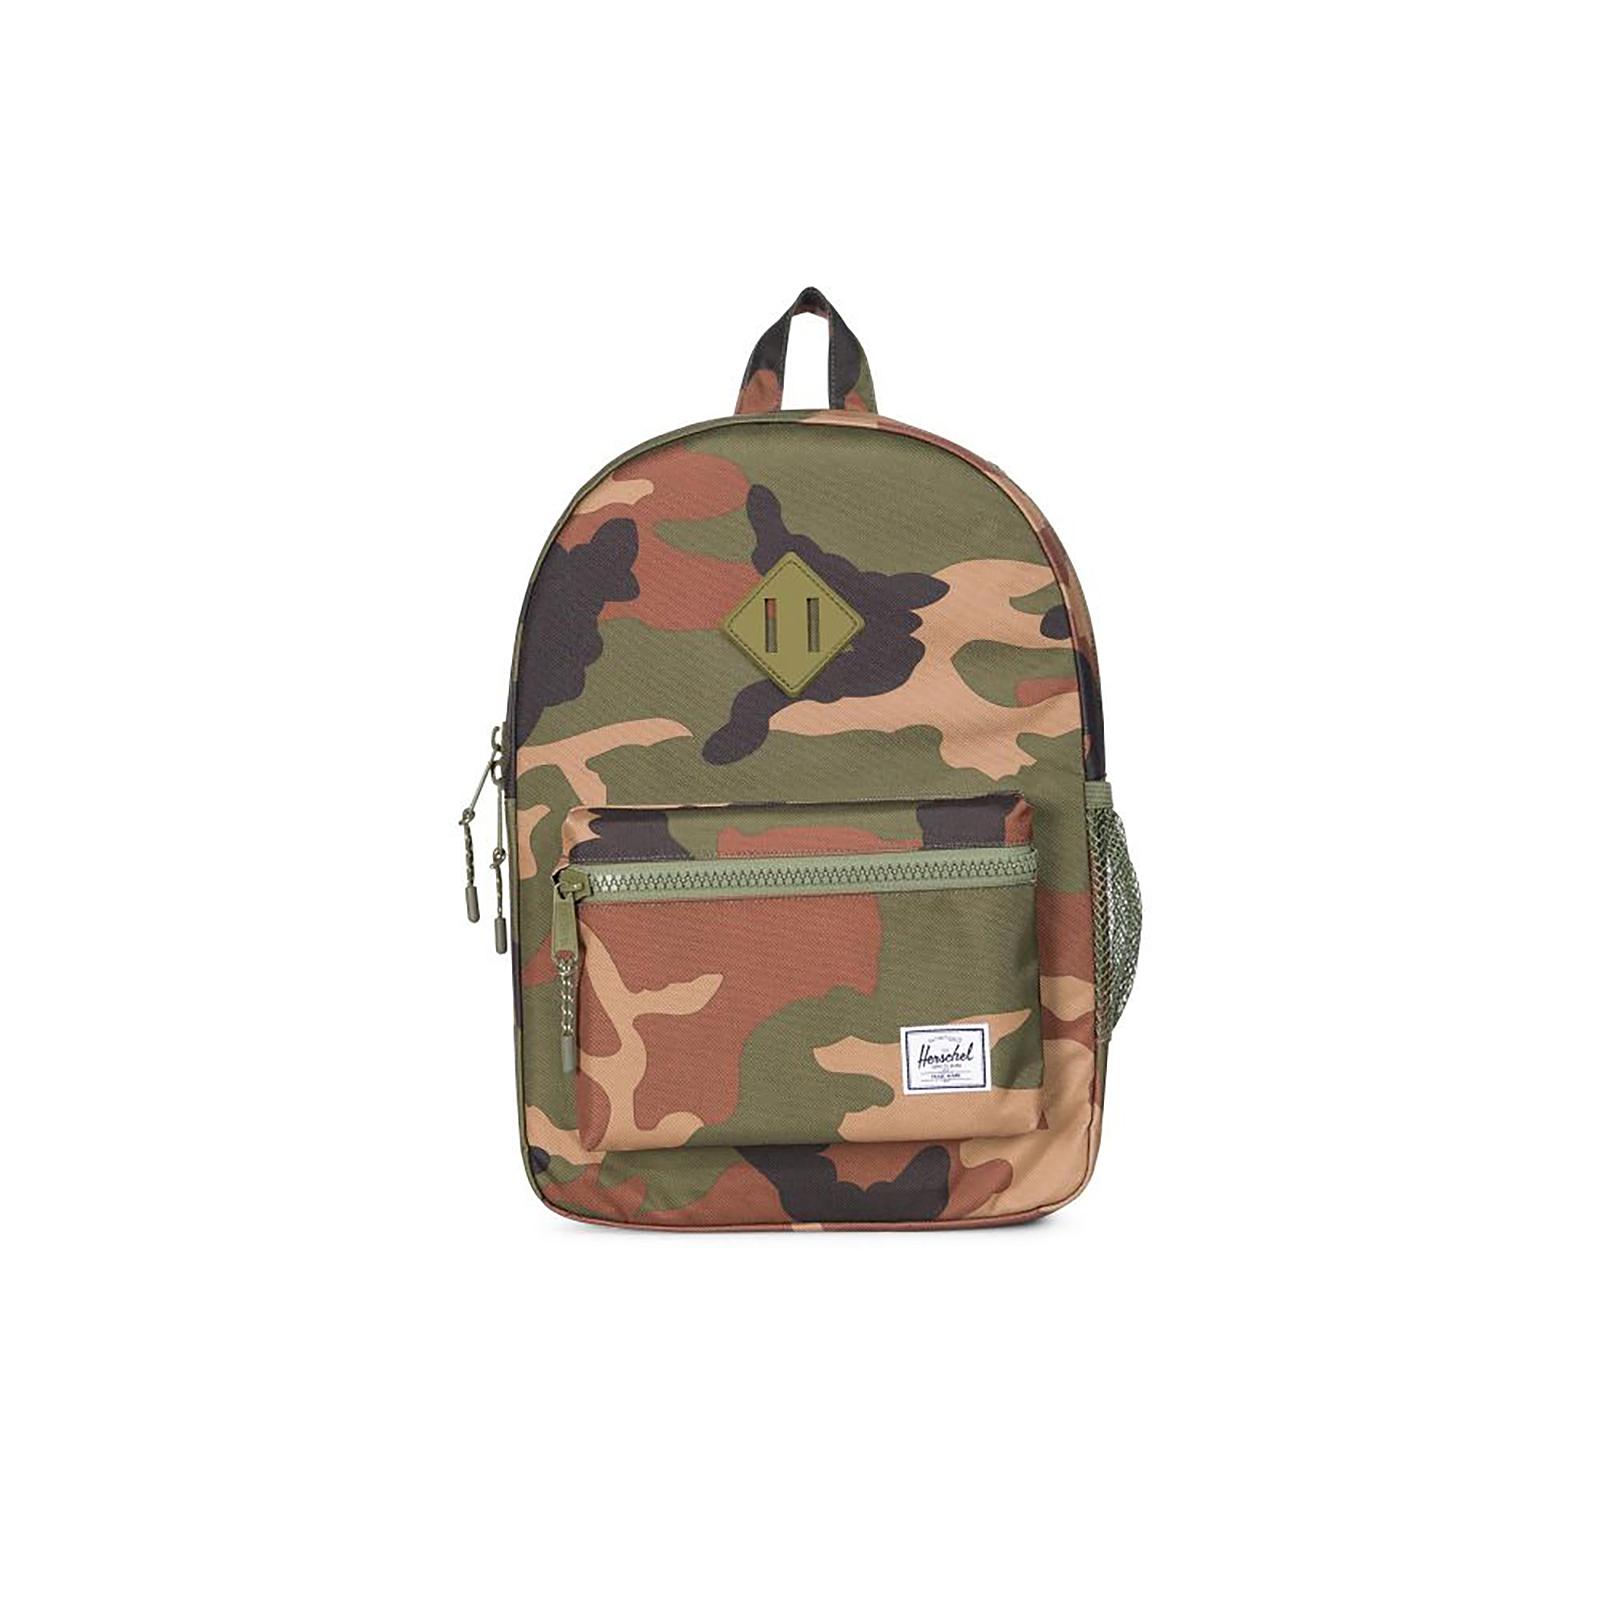 2e7a7e9f9b Herschel Heritage Youth Backpack Bag 38 Cm (woodland Camo-army ...